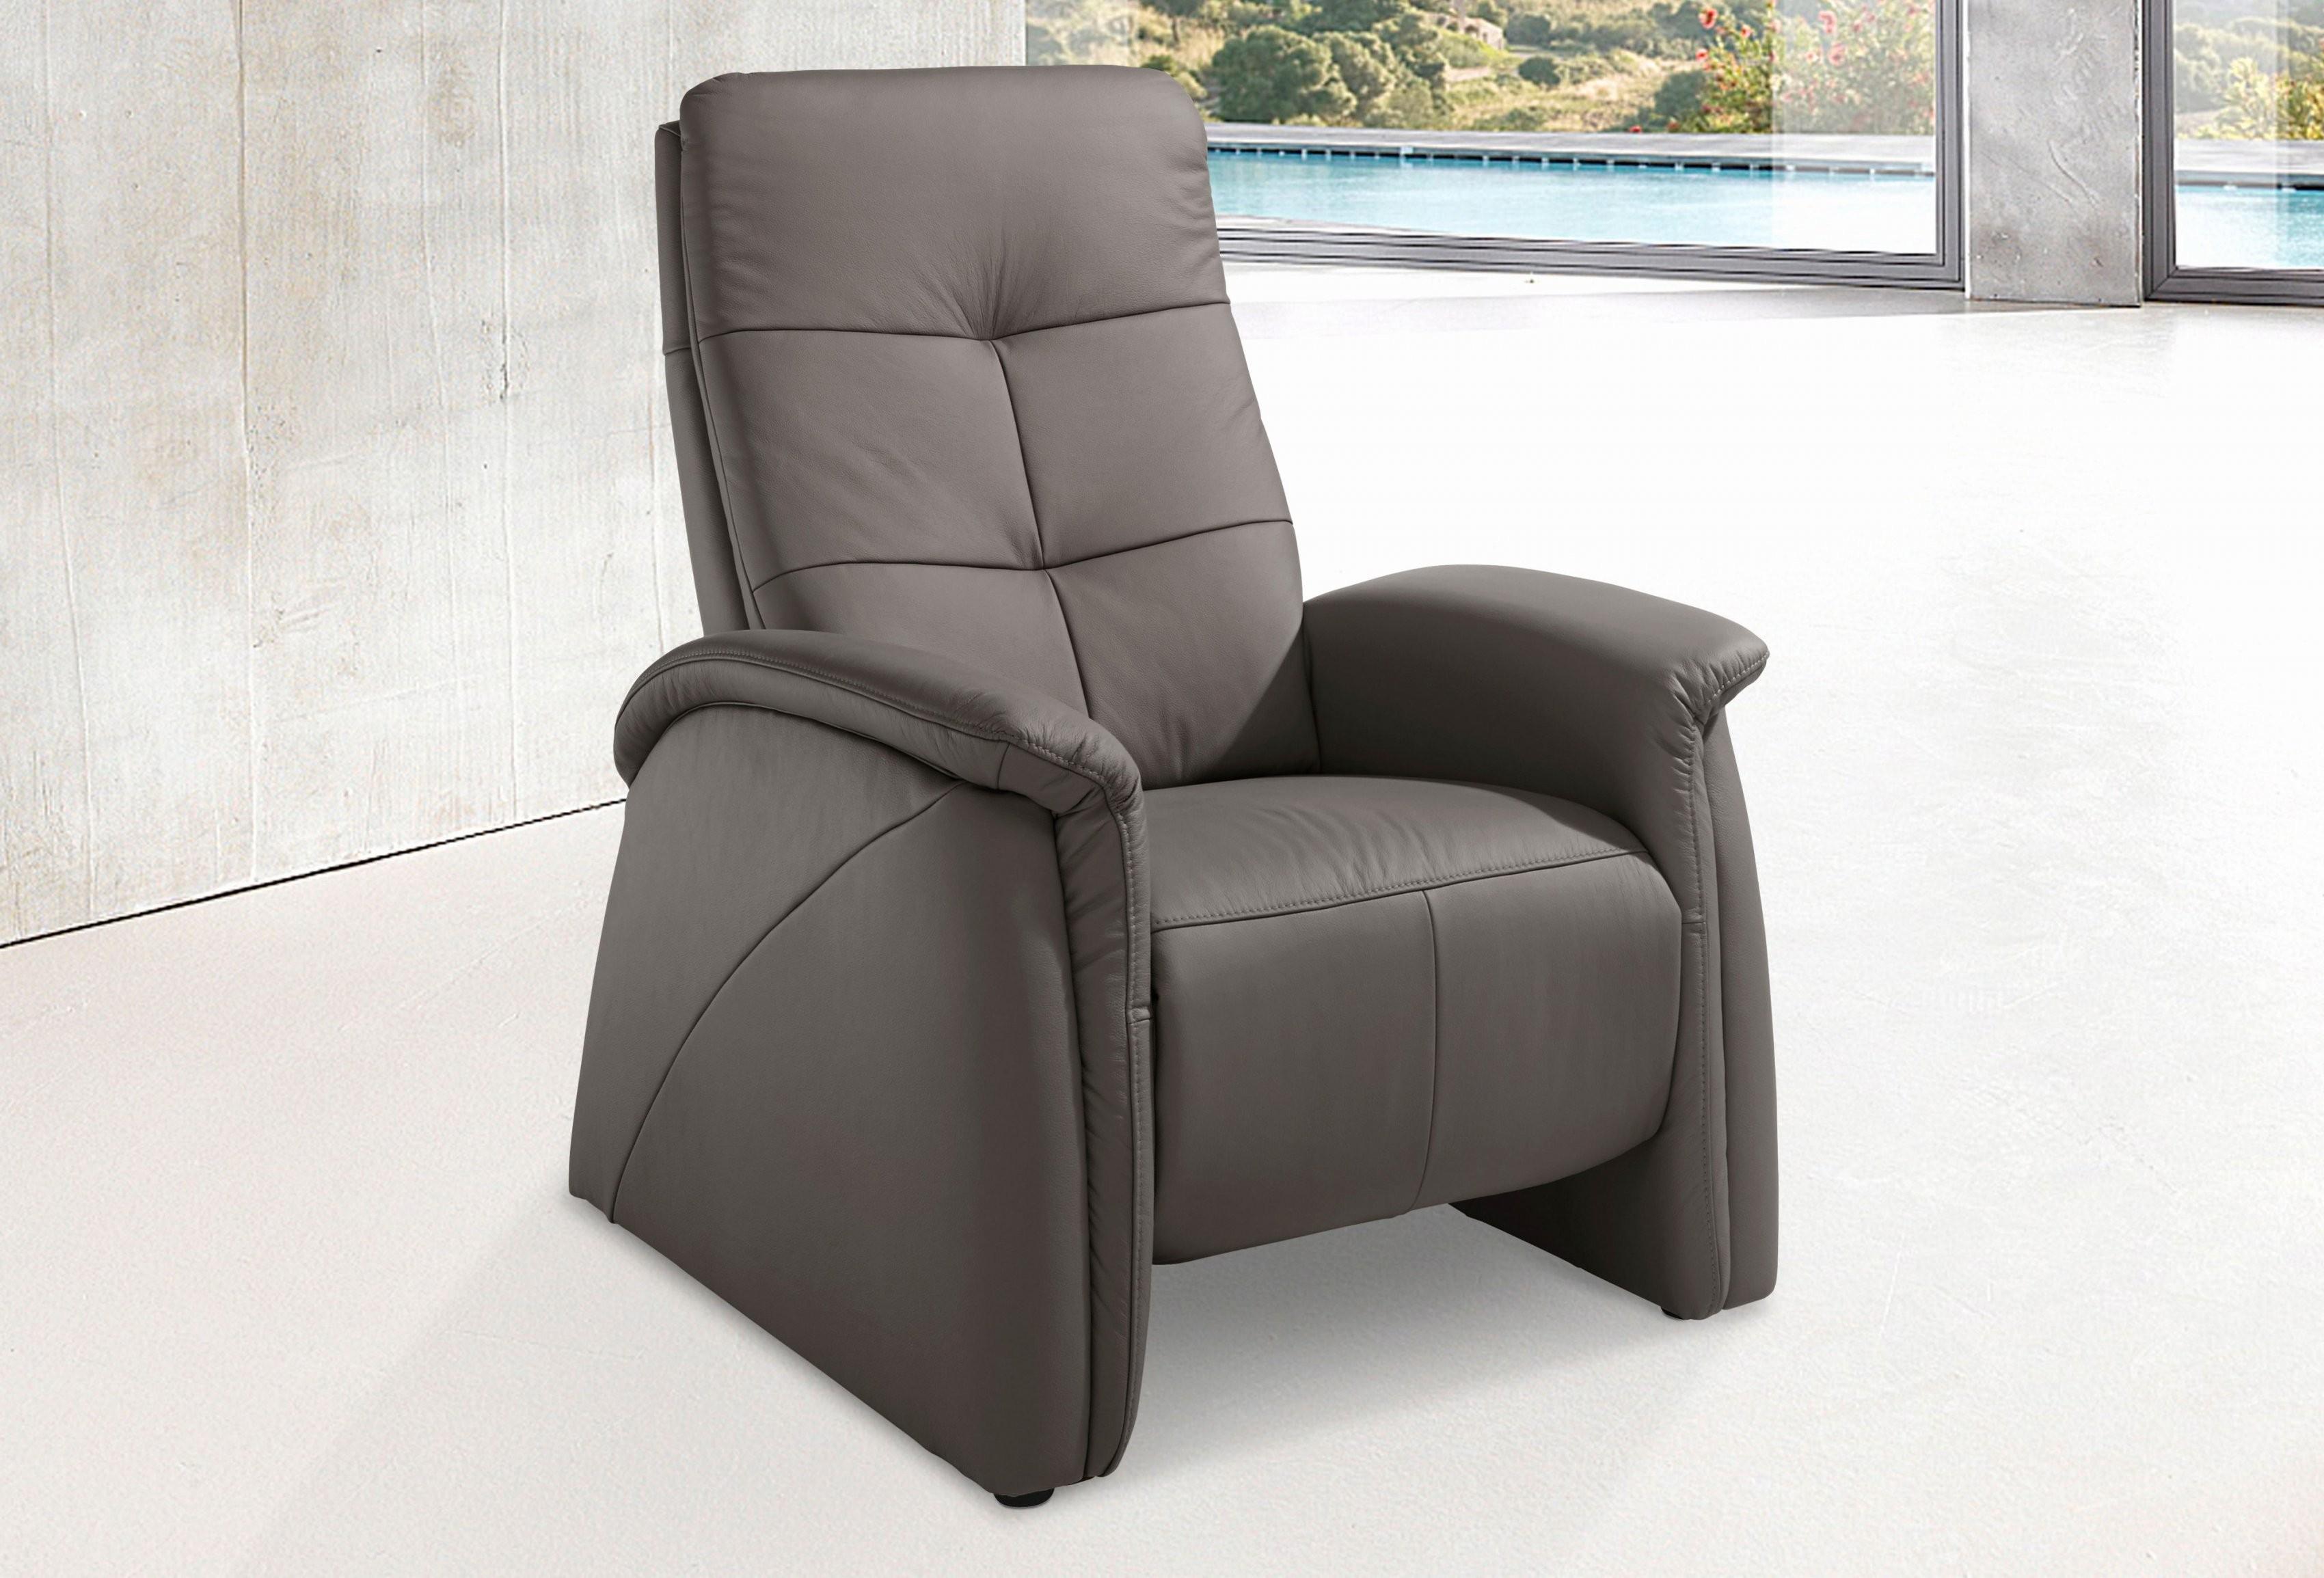 Sofa Attraktiv 2 Sitzer City Sofa Mit Relaxfunktion Ideen Lieblich von 2 Sitzer City Sofa Mit Relaxfunktion Photo